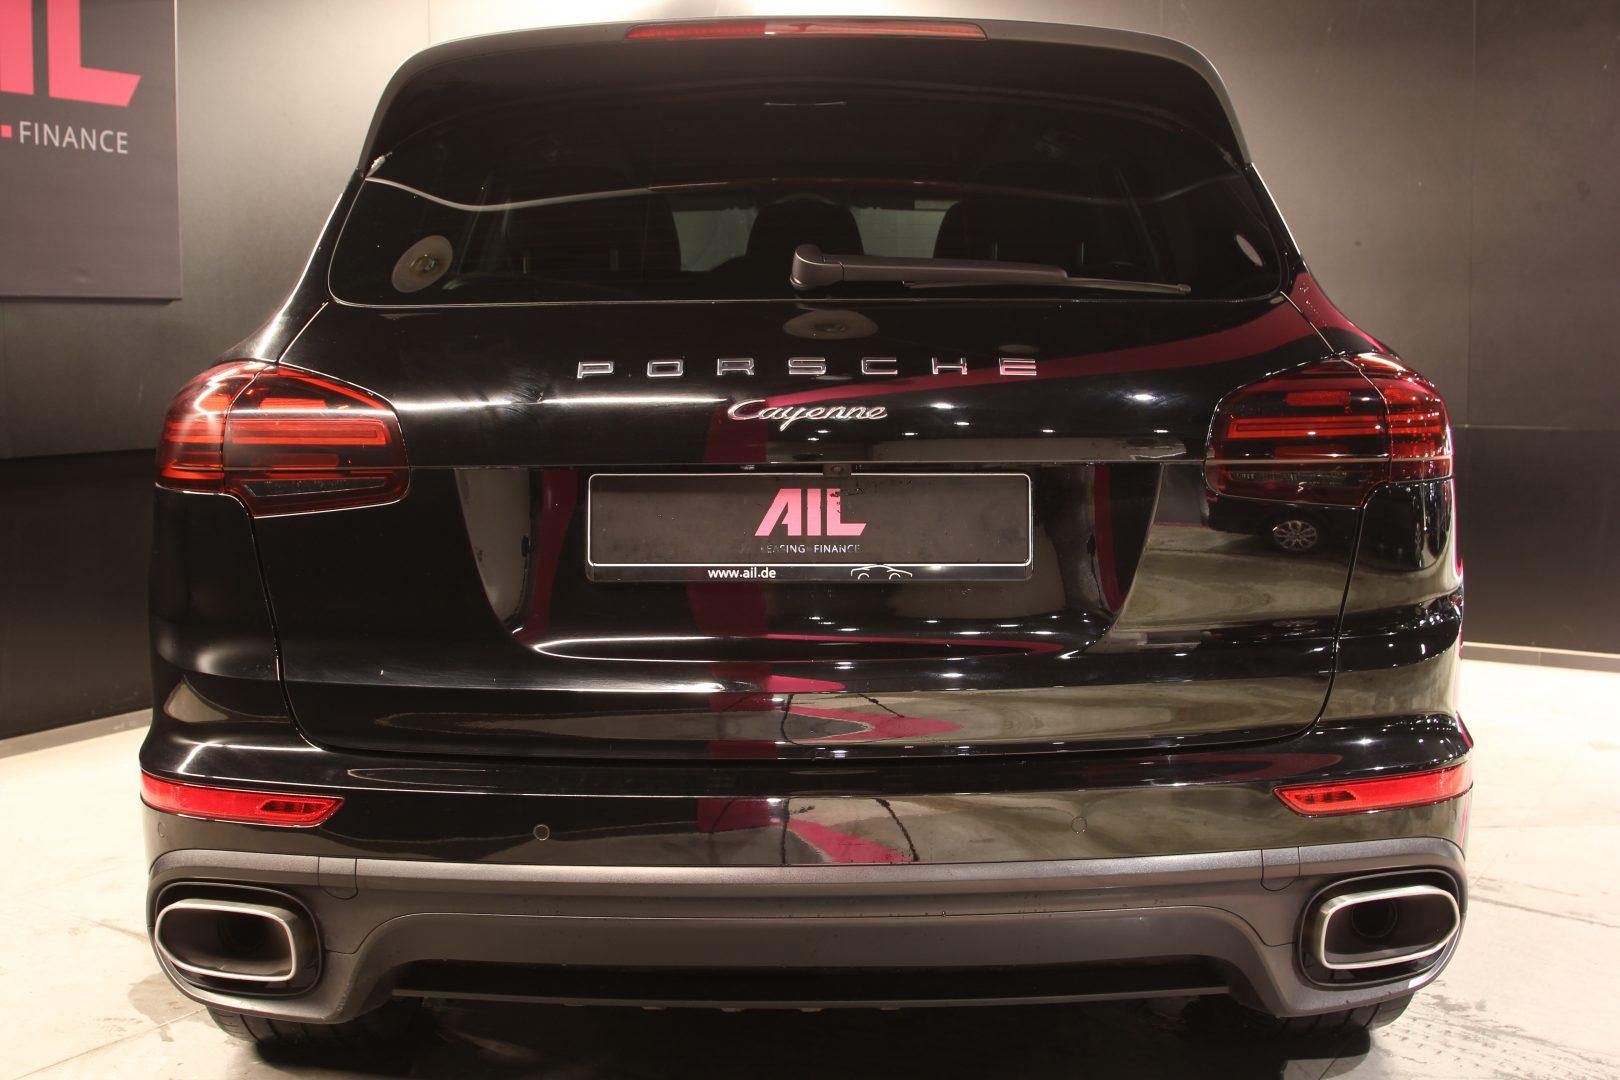 AIL Porsche Cayenne Panorama 21 Zoll  2